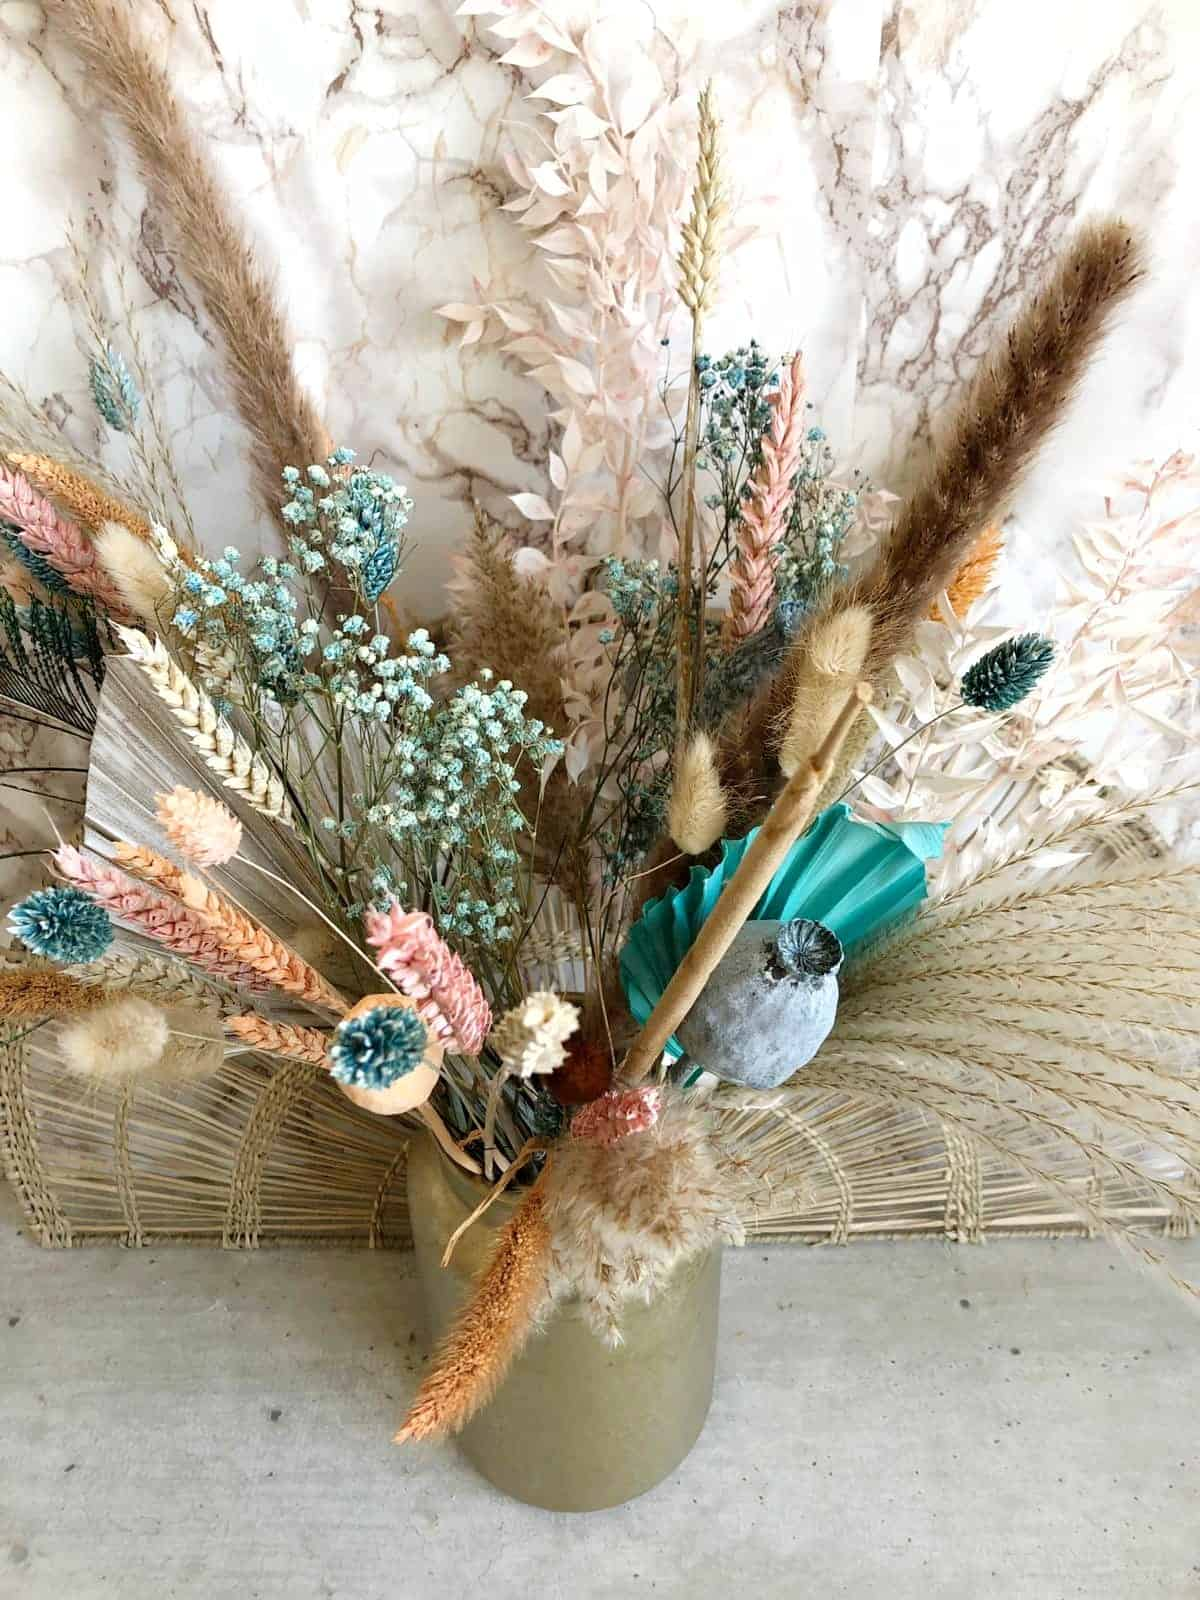 Boeket-droogbloemen-marrakech-flowers4